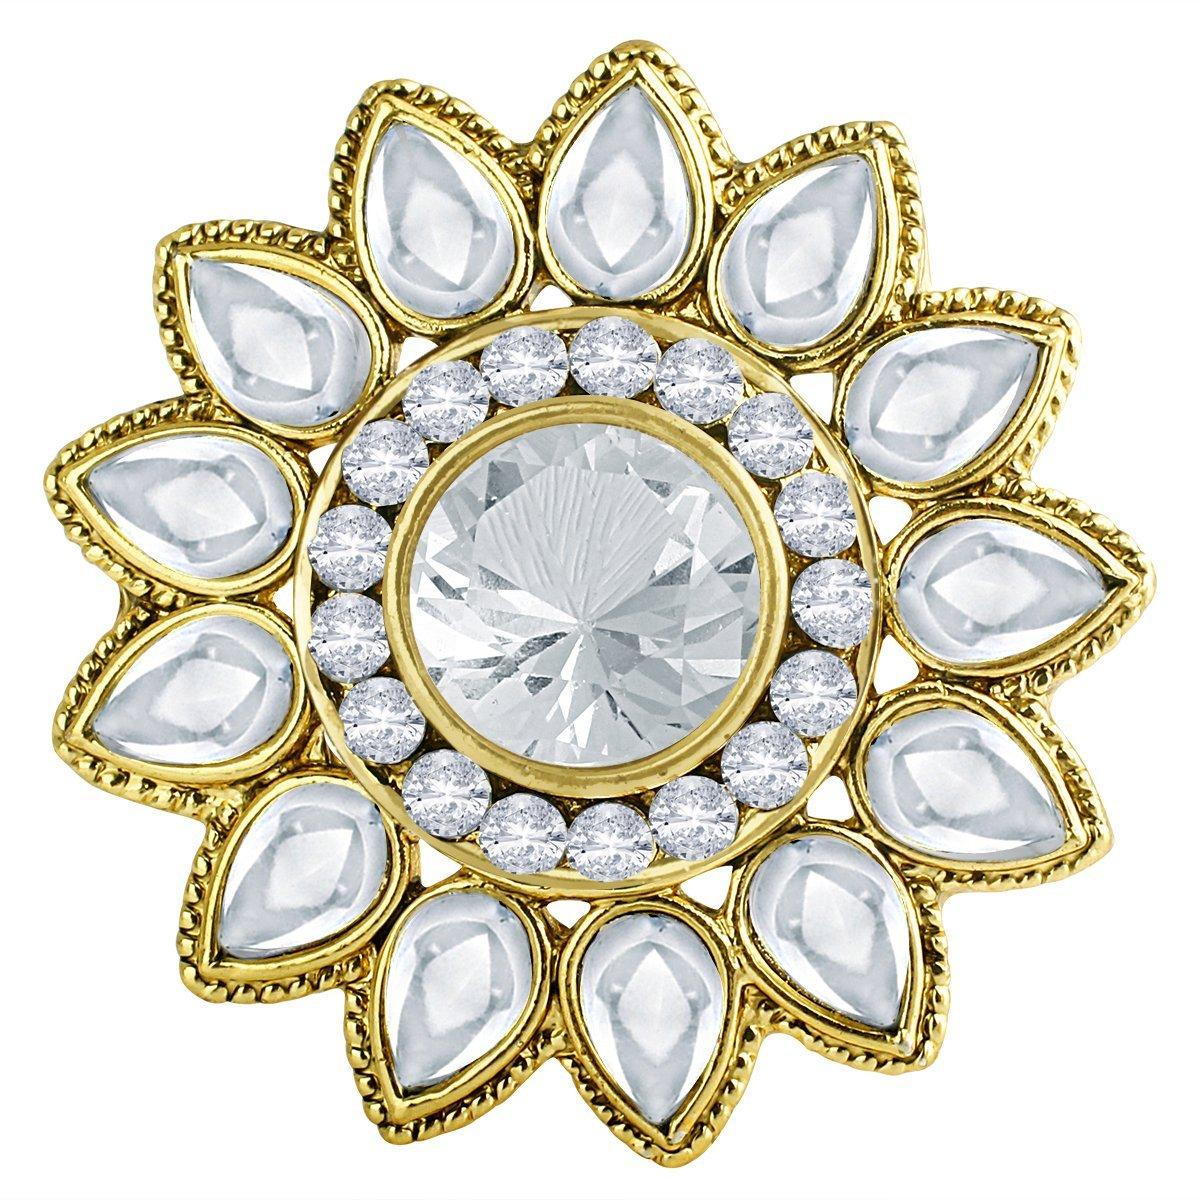 Spargz Women's Antique Wedding Octagon Stone Adjustable Finger Ring Gold